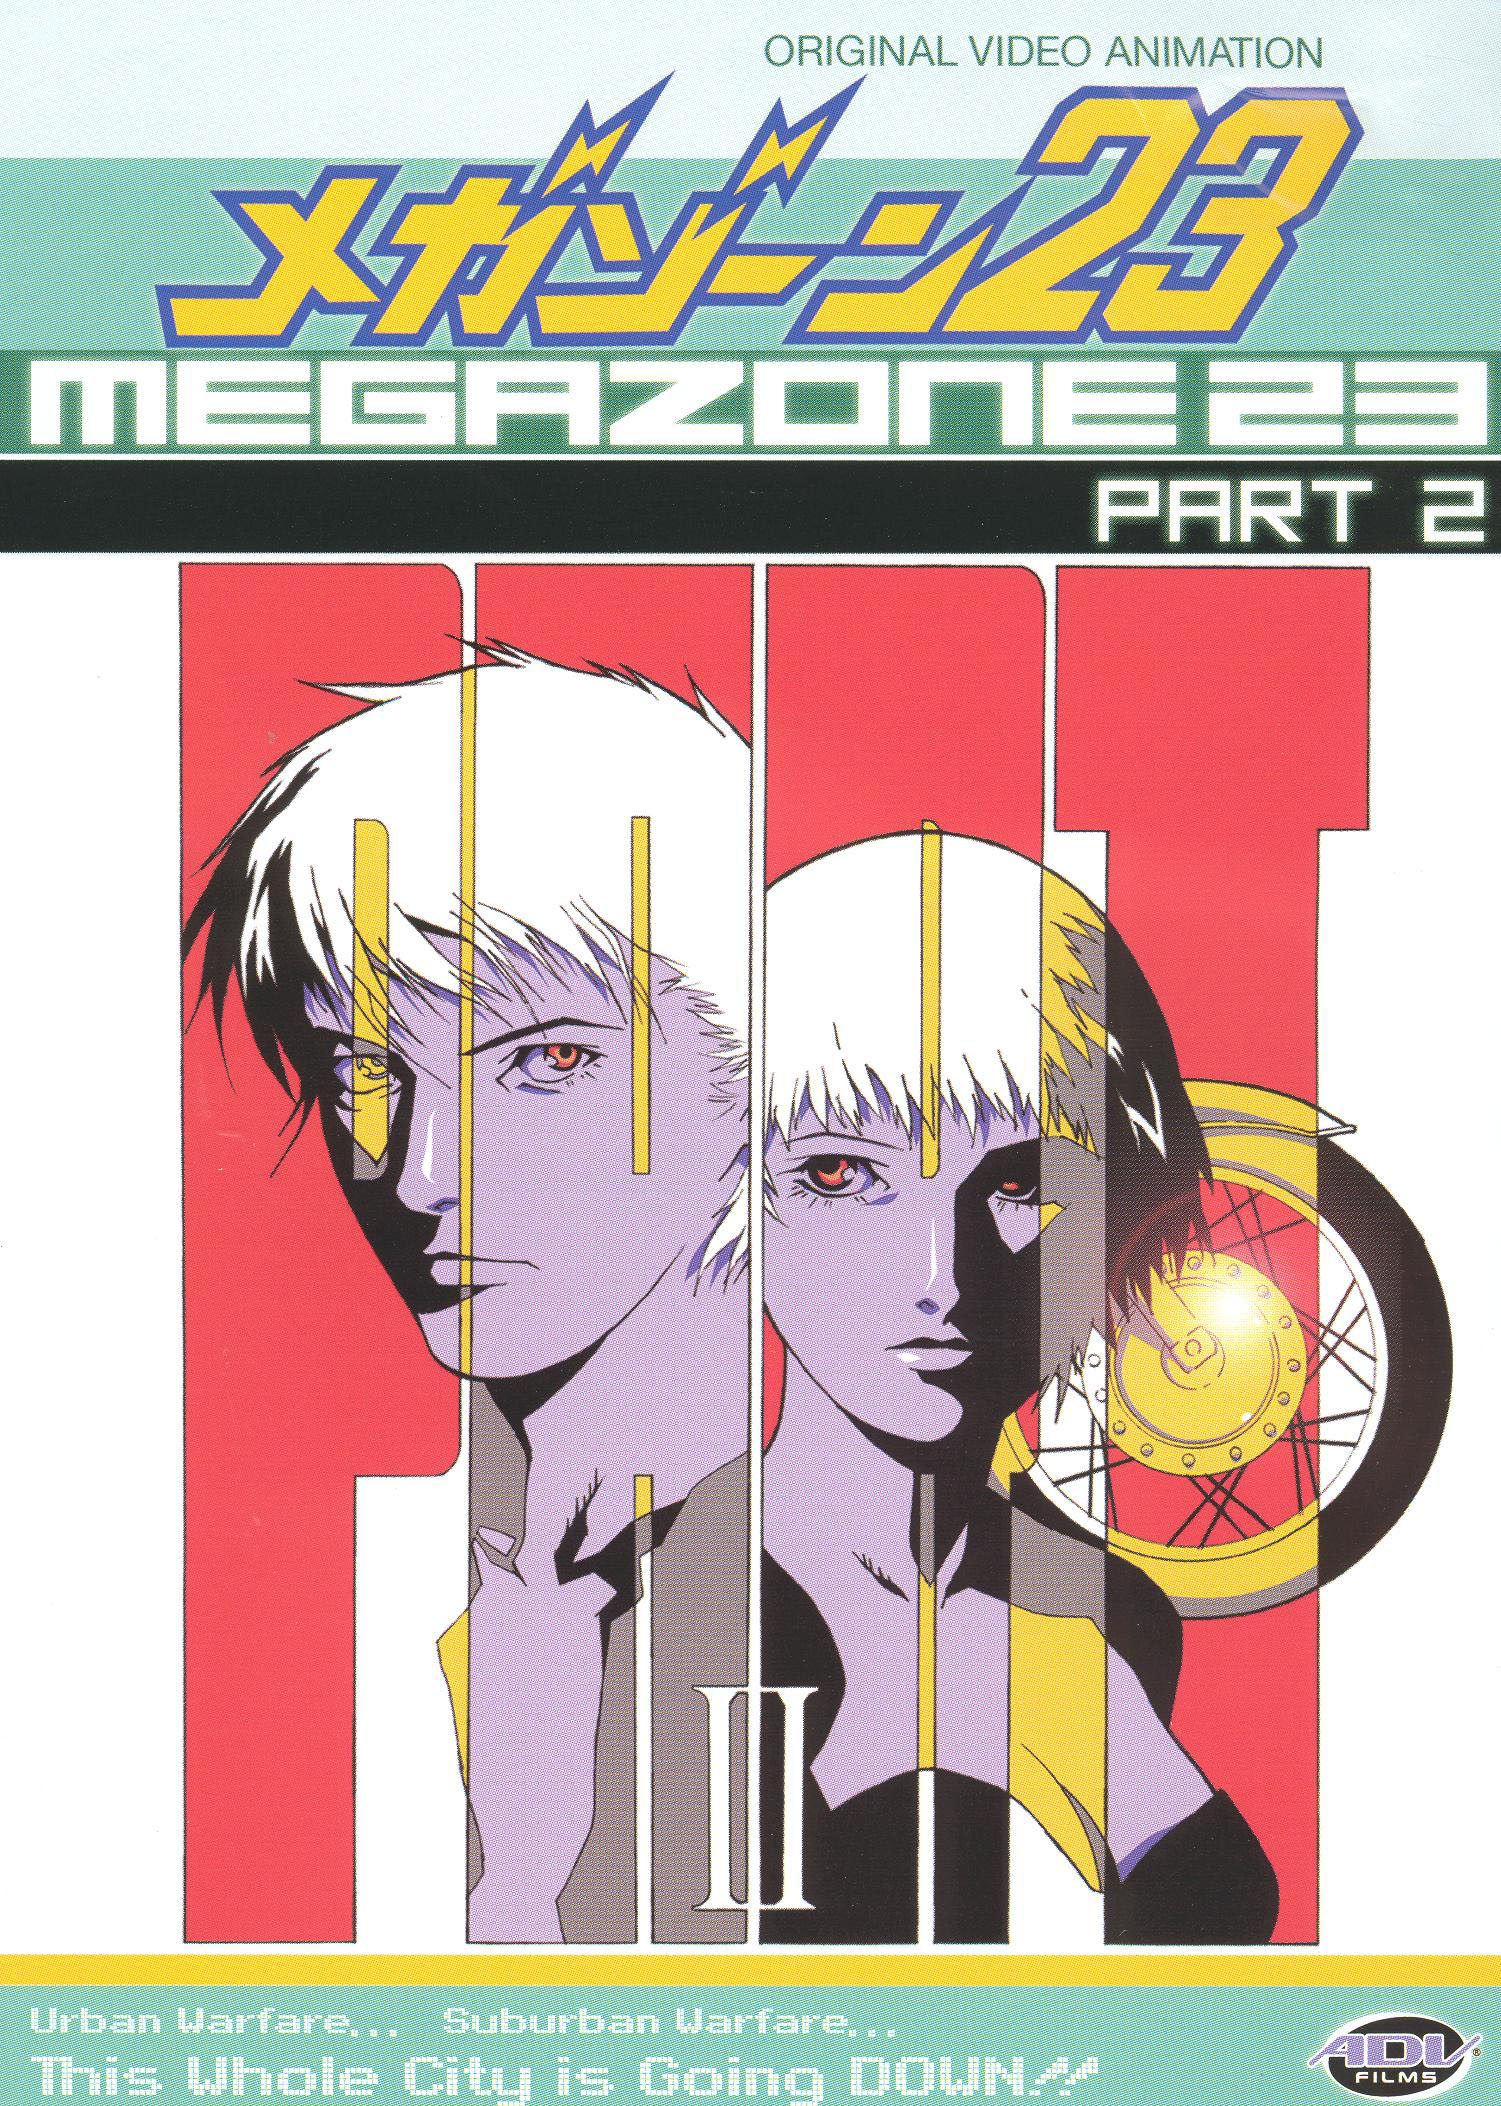 Megazone 23, Part 2 [Anime OVA]